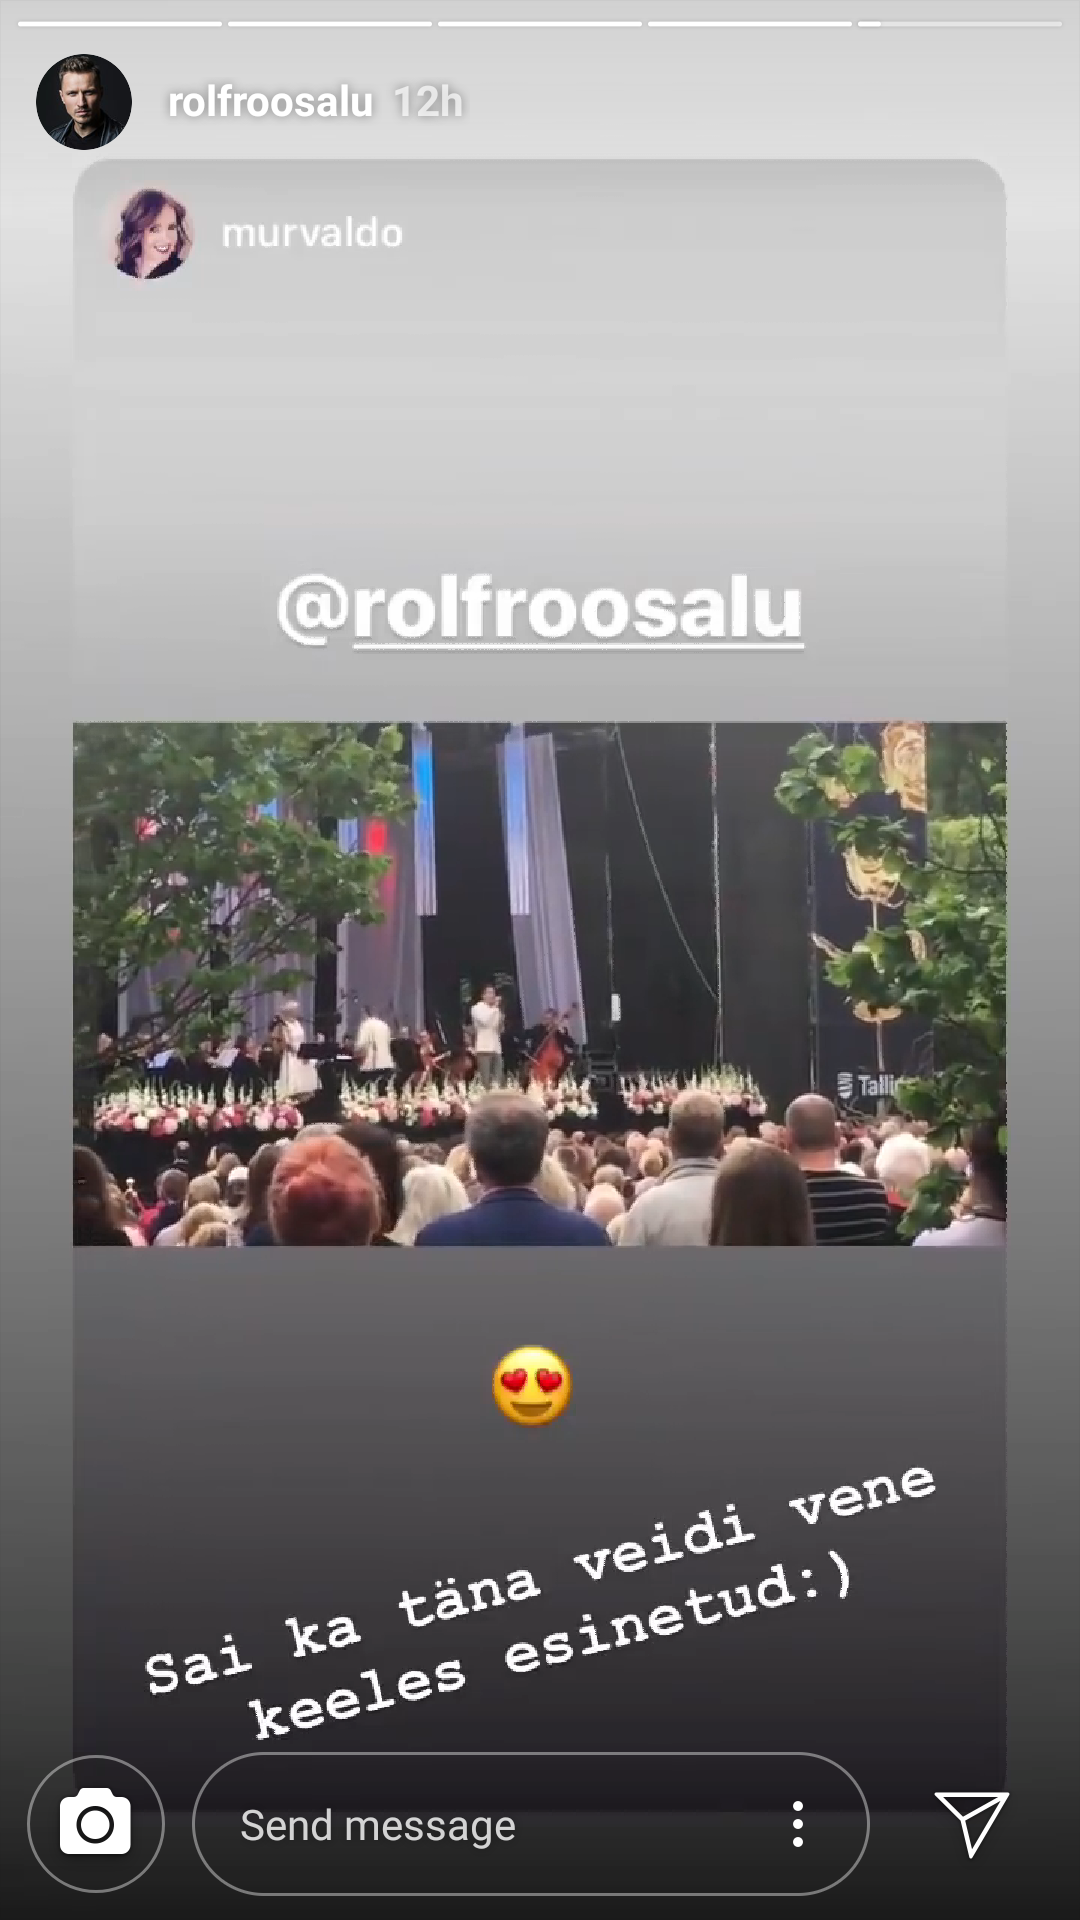 Instagrami kuvahõive